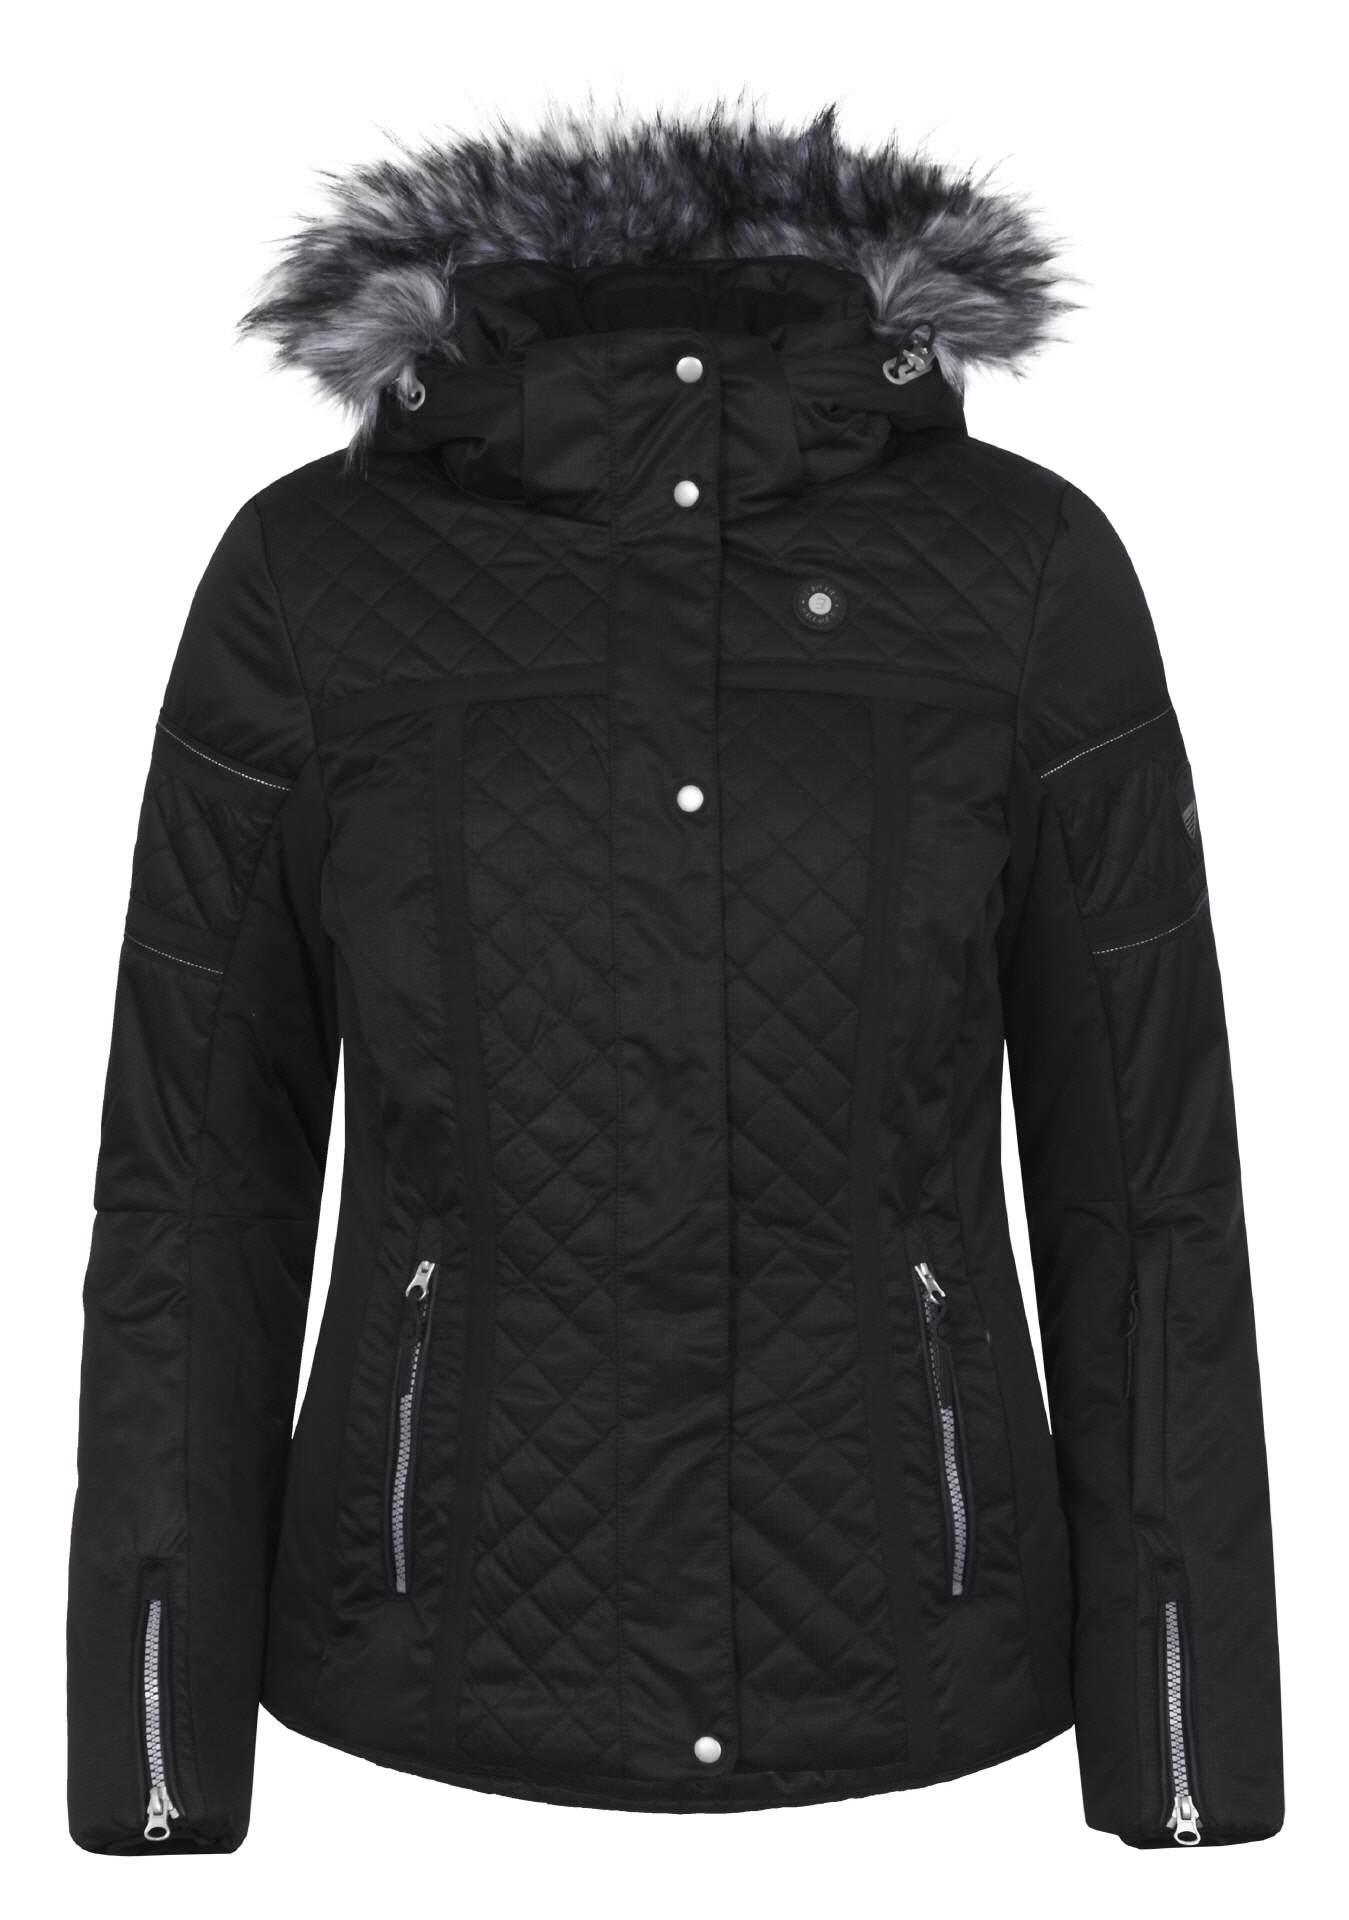 mode sport trends damen skijacke icepeak carol black. Black Bedroom Furniture Sets. Home Design Ideas